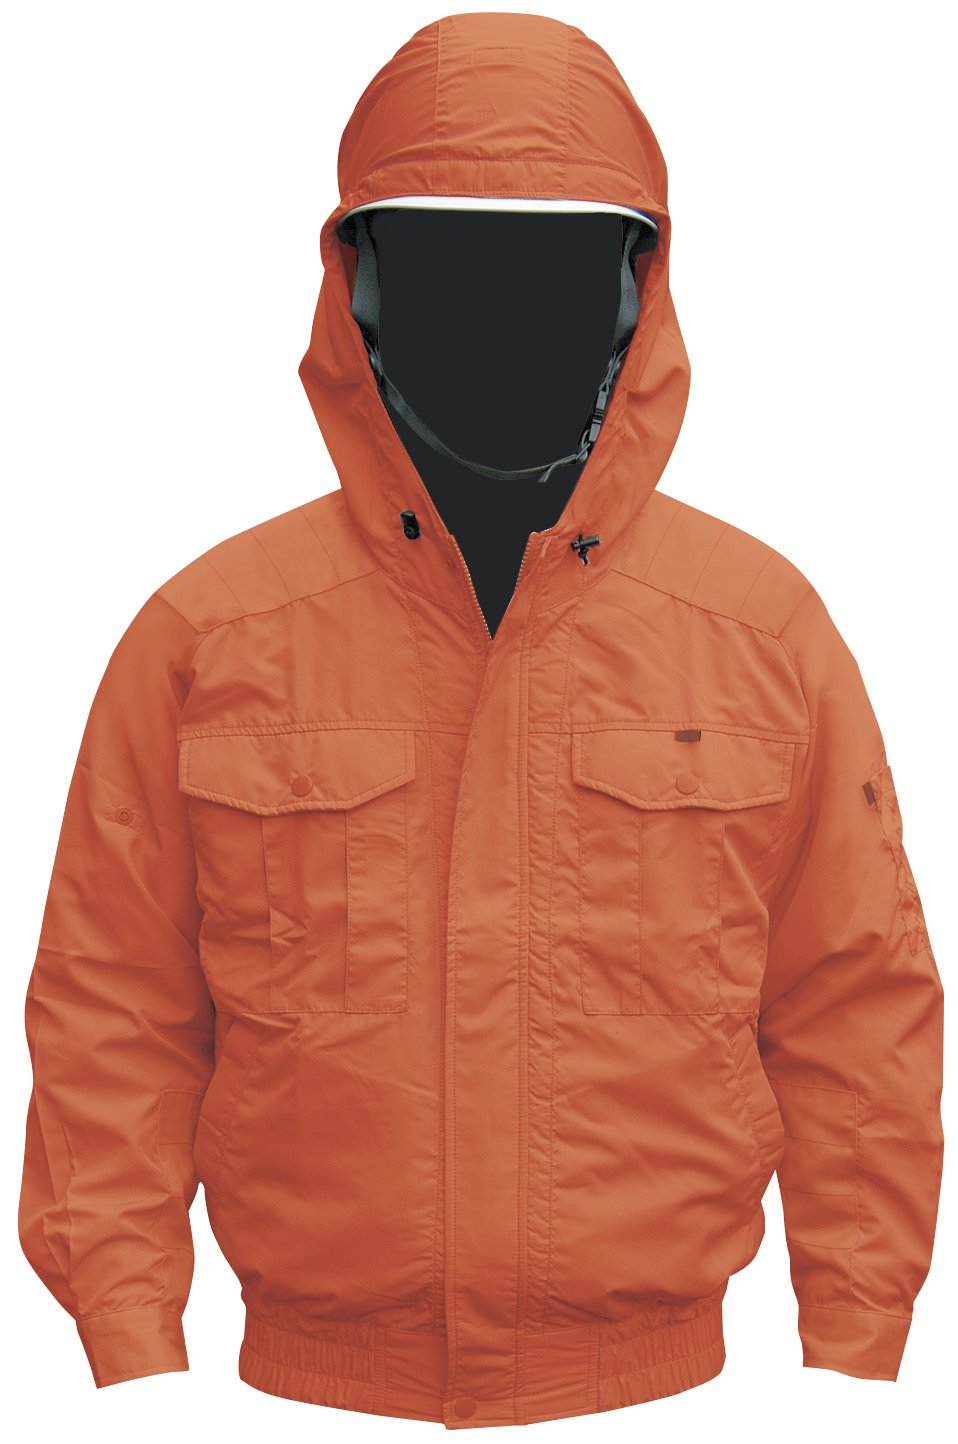 NSP 空調服 服単体 チタンコーティング フード付 肩袖補強あり オレンジ サイズM 8207899 B00U5S73LQ M|オレンジ